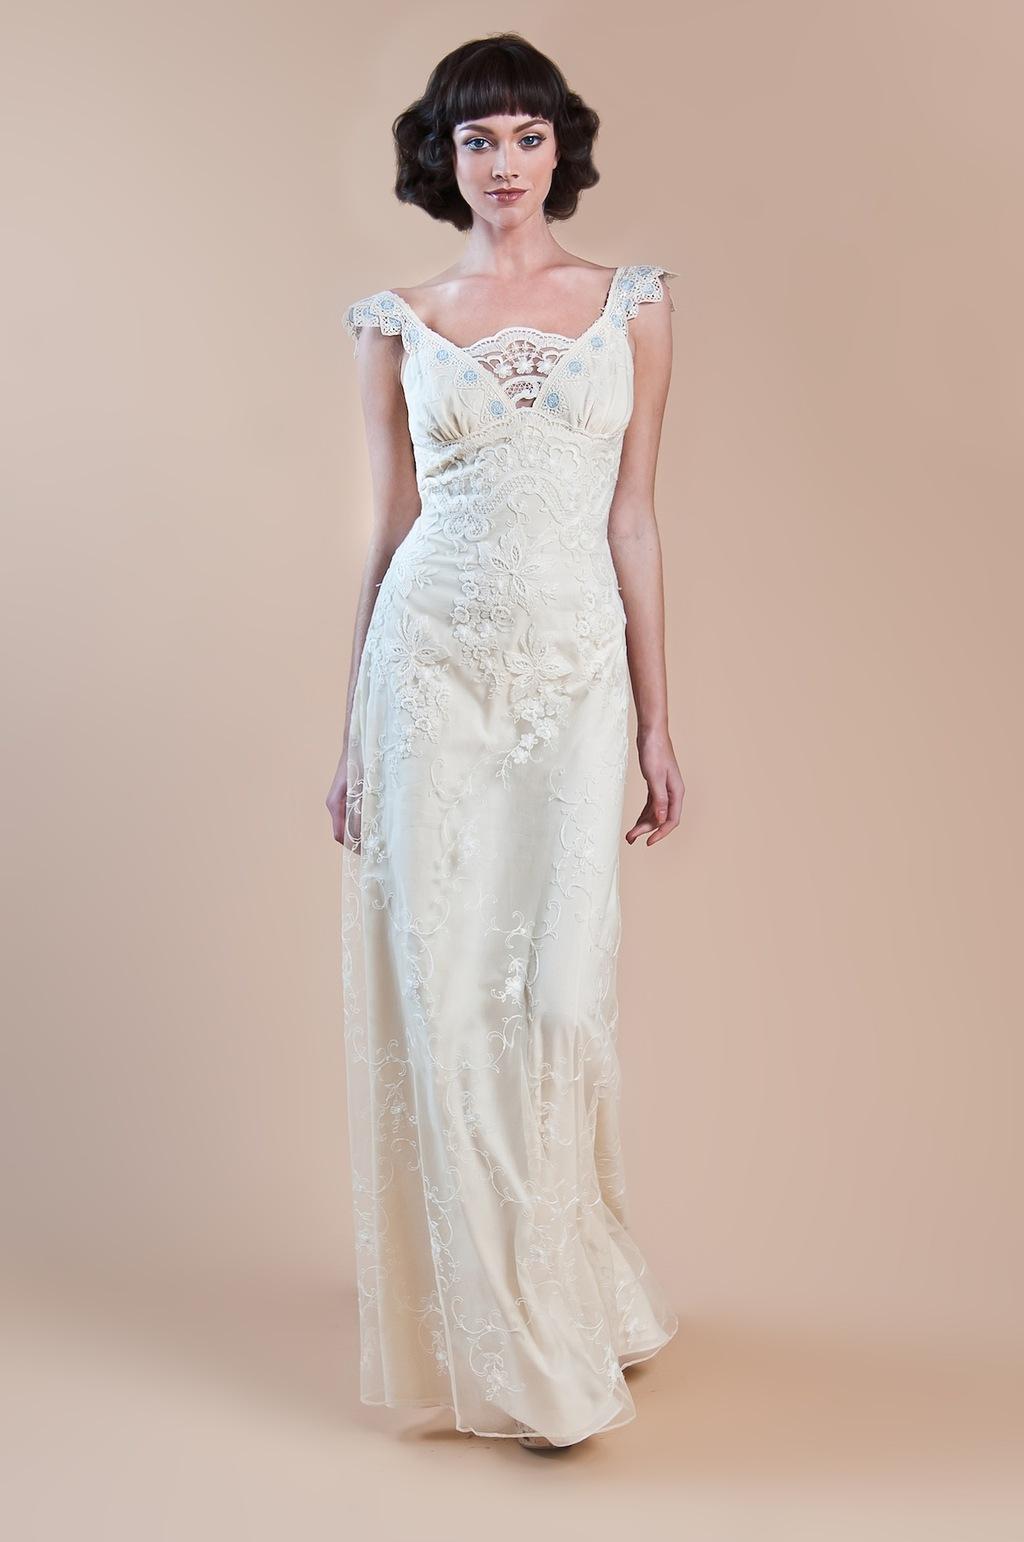 2013-wedding-dress-claire-pettibone-windsor-rose-collection-waverly2.full